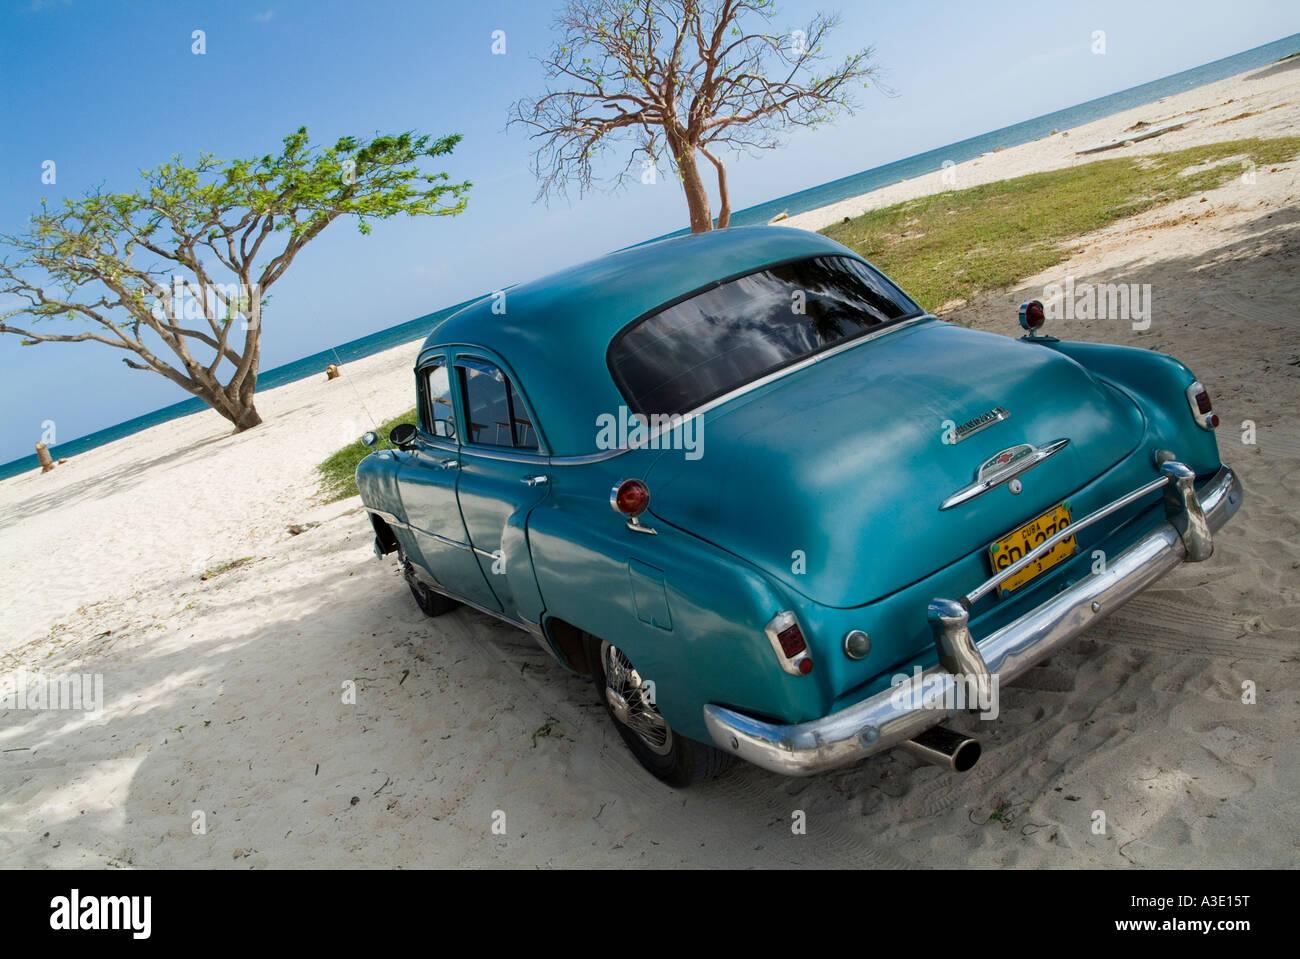 cuba beach car stockfotos cuba beach car bilder seite. Black Bedroom Furniture Sets. Home Design Ideas